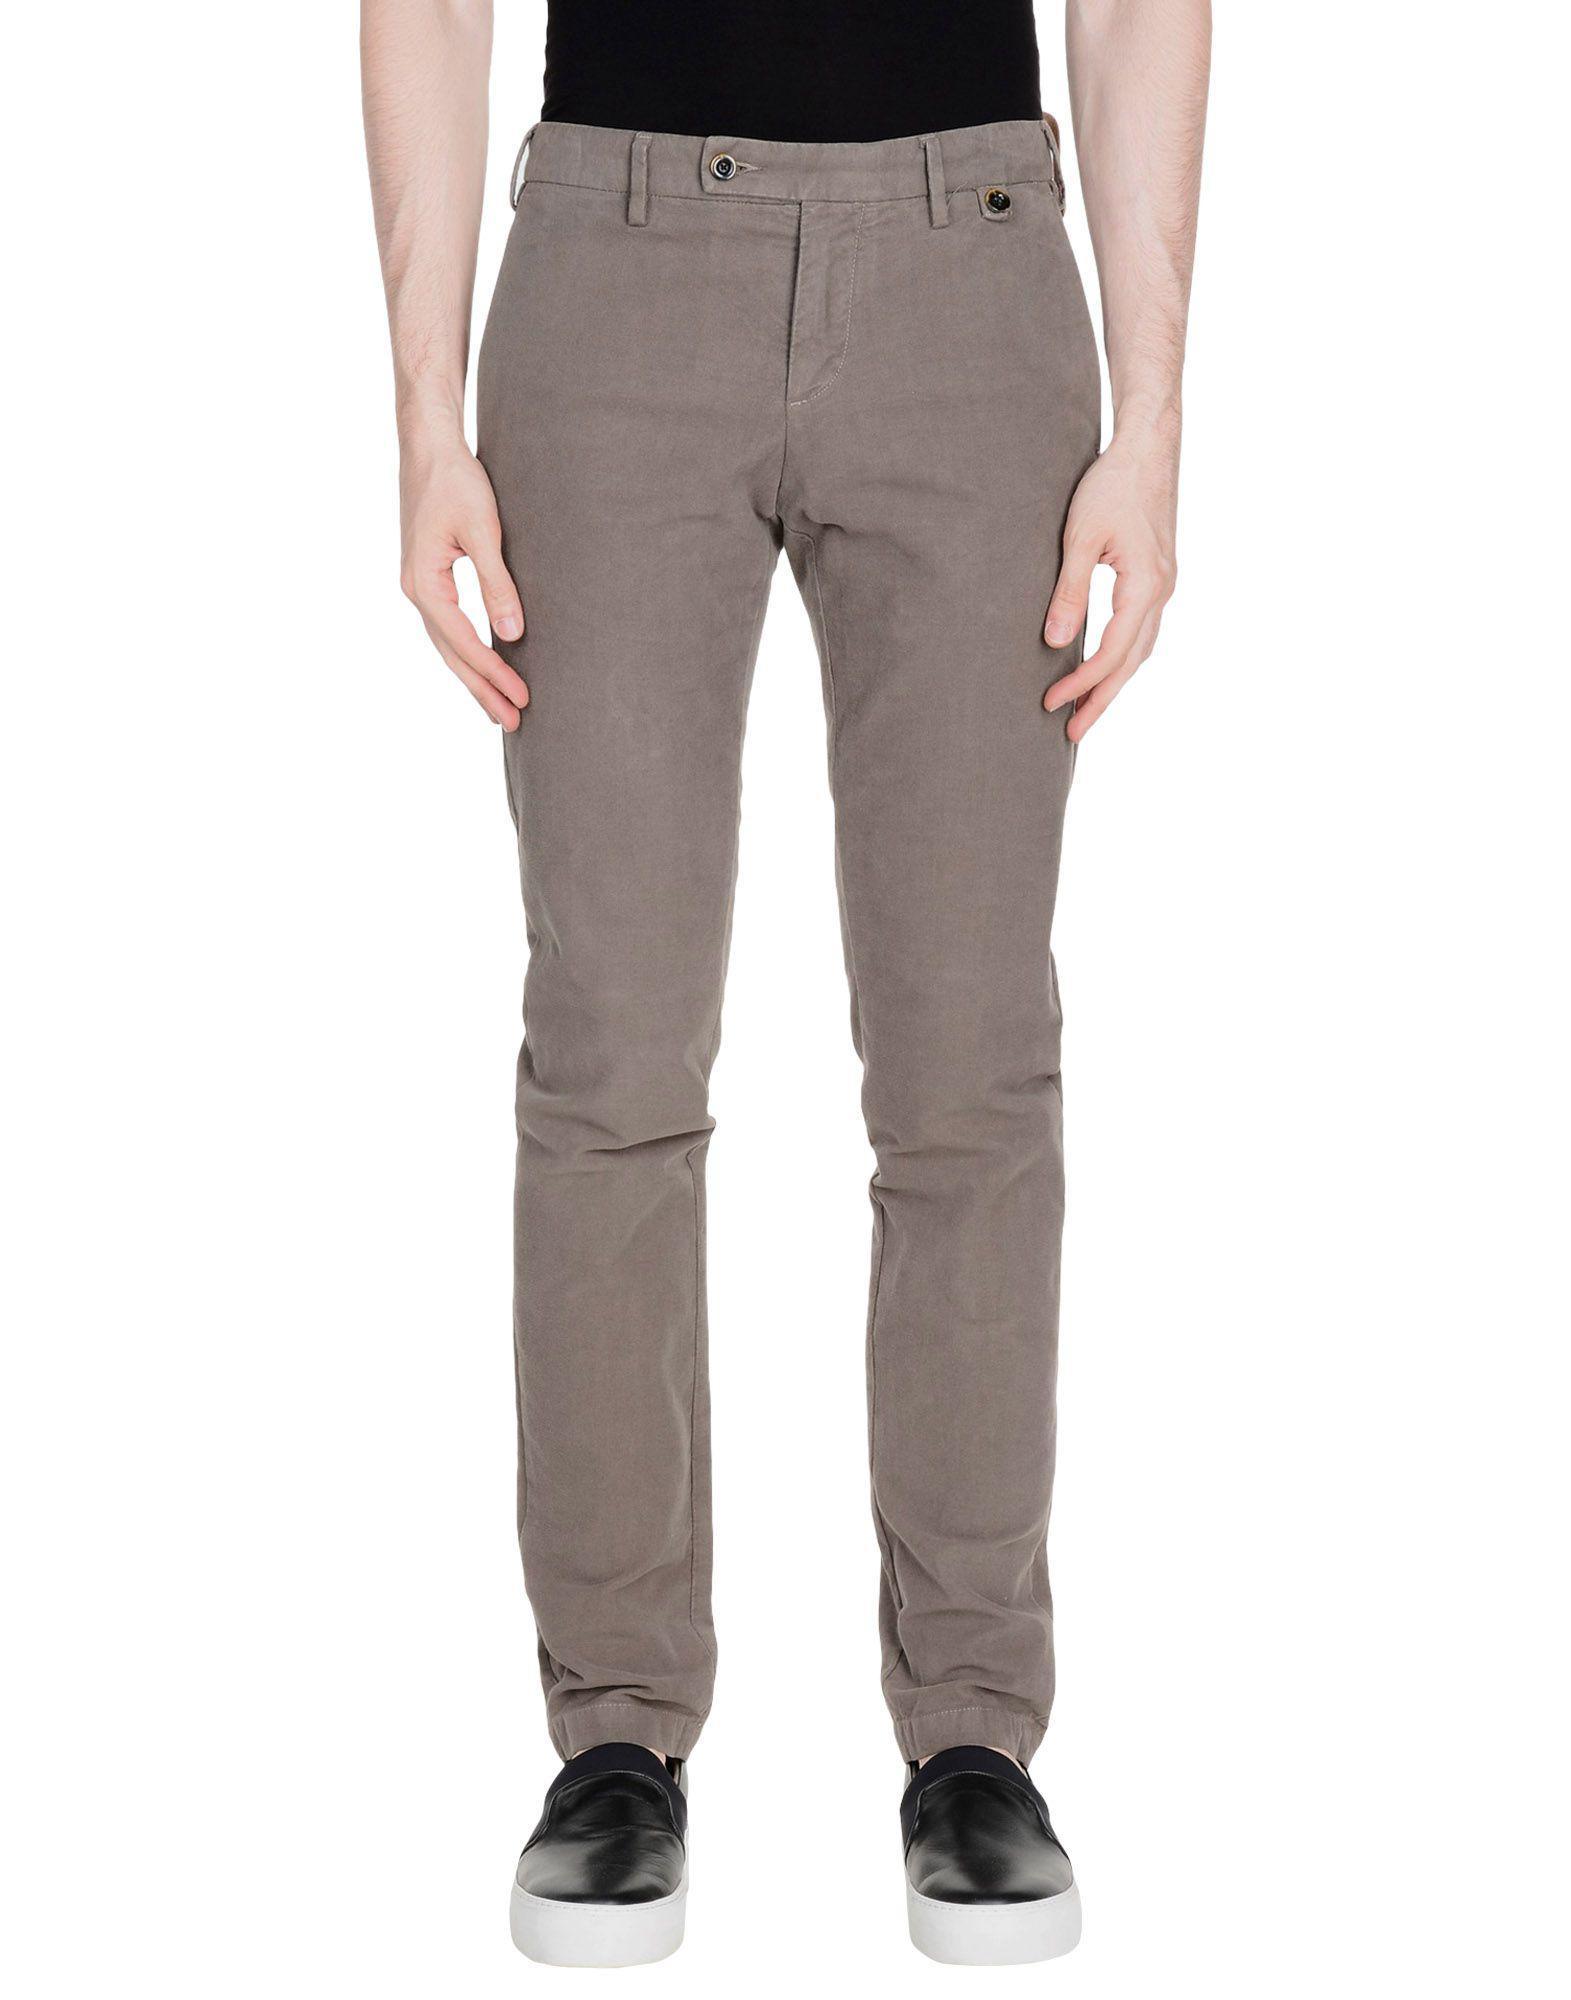 25d8fef096 Lyst - Pantalones AT.P.CO de hombre de color Gris